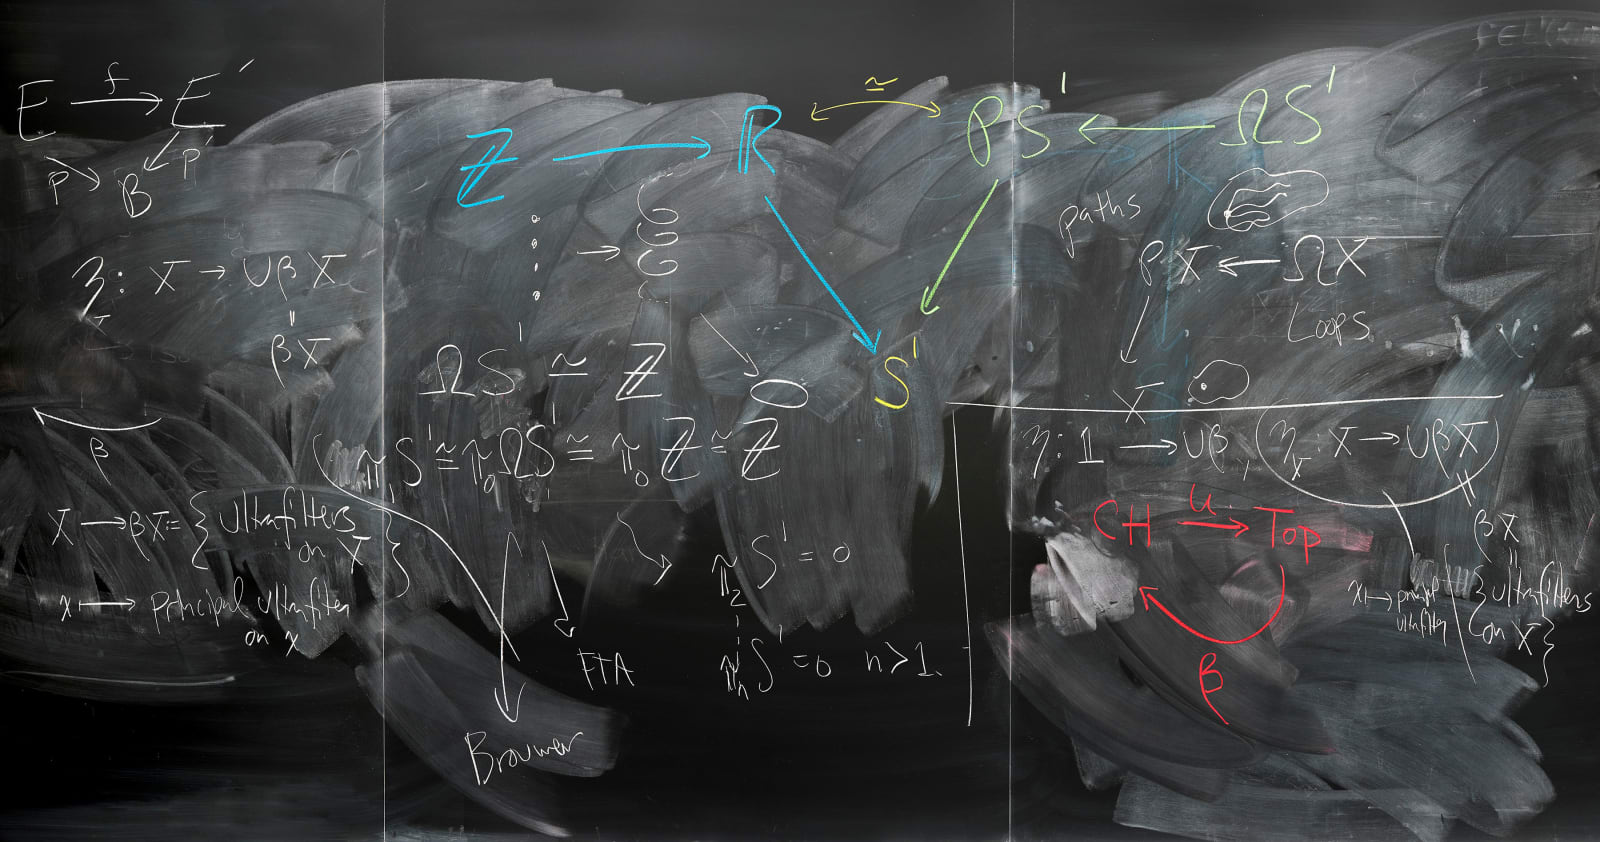 Jessica Wynne John Terilla and Tai-Danae Bradley blackboard with mathematical chalk drawings